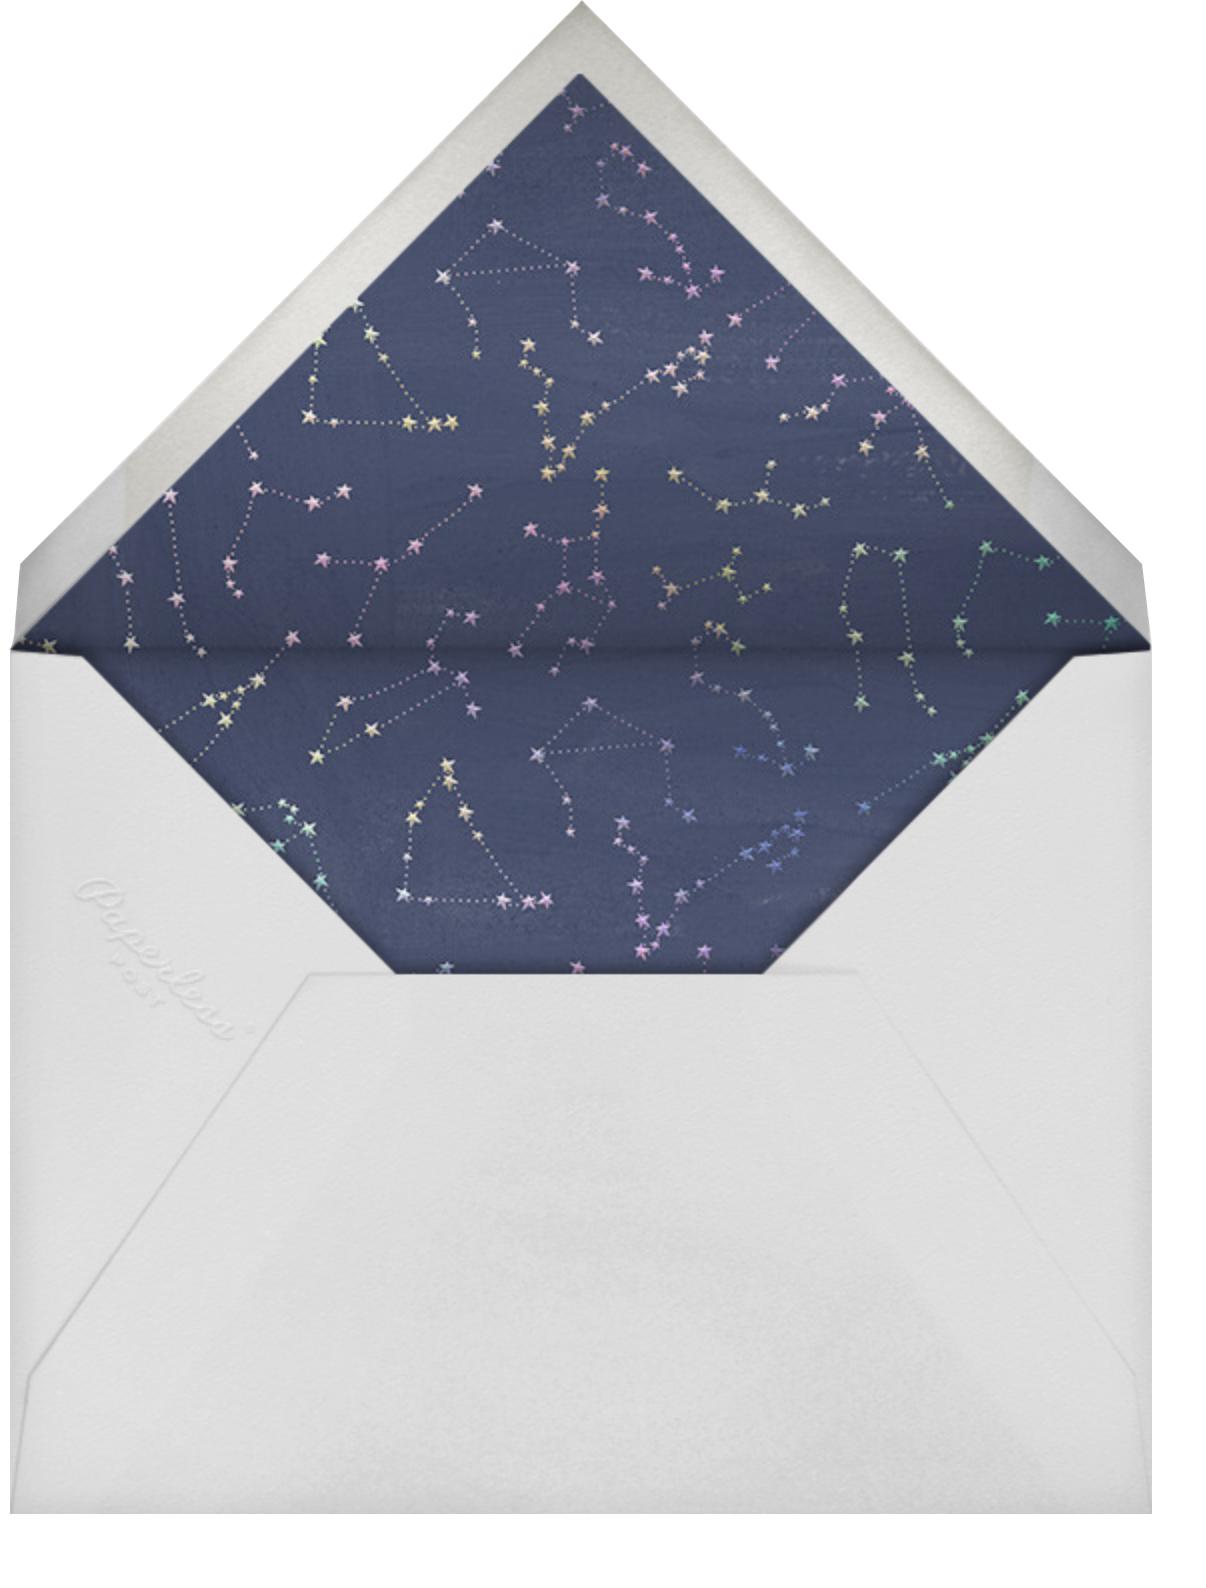 Your Season - Taurus - Paperless Post - Adult birthday - envelope back